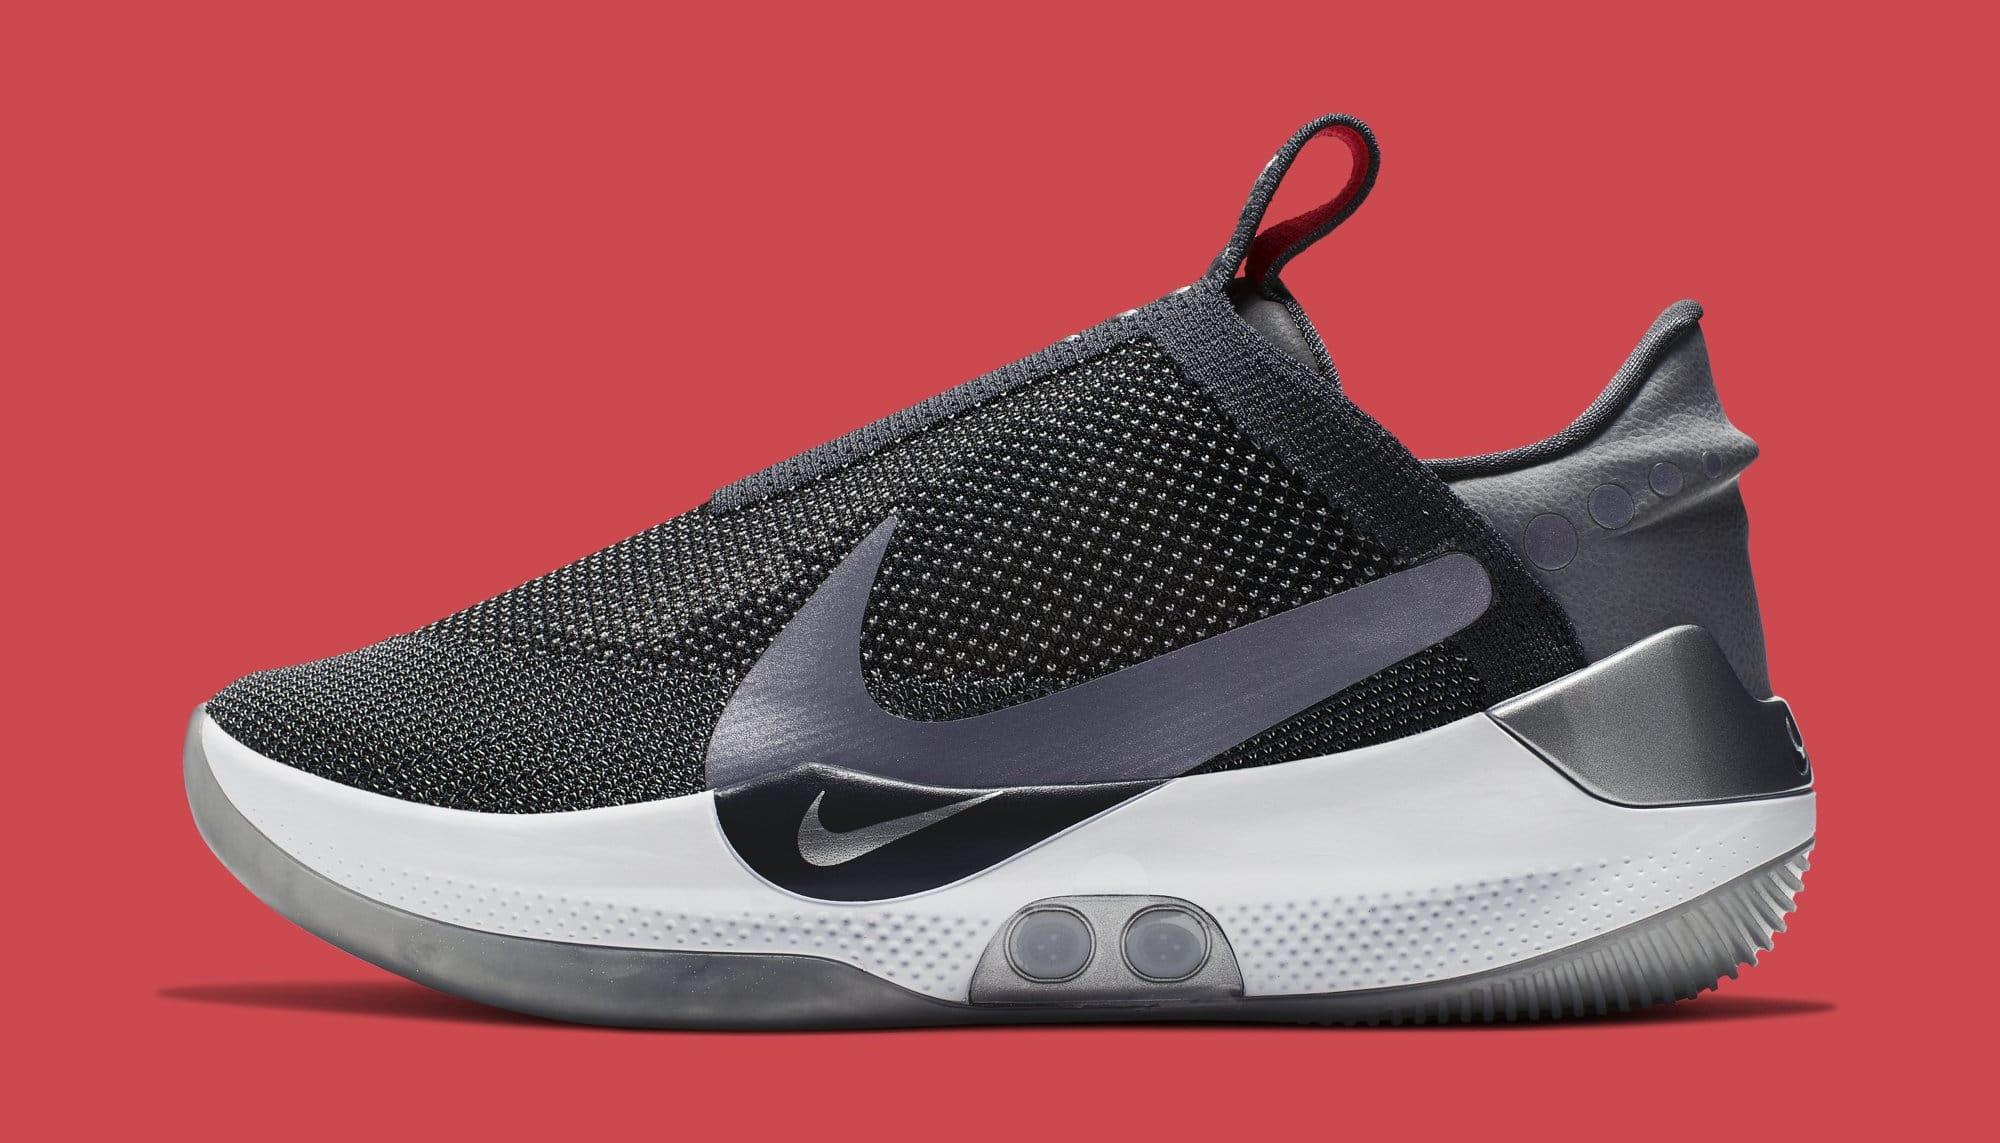 Nike Adapt BB 'Dark Grey' AO2582-004 (Lateral)